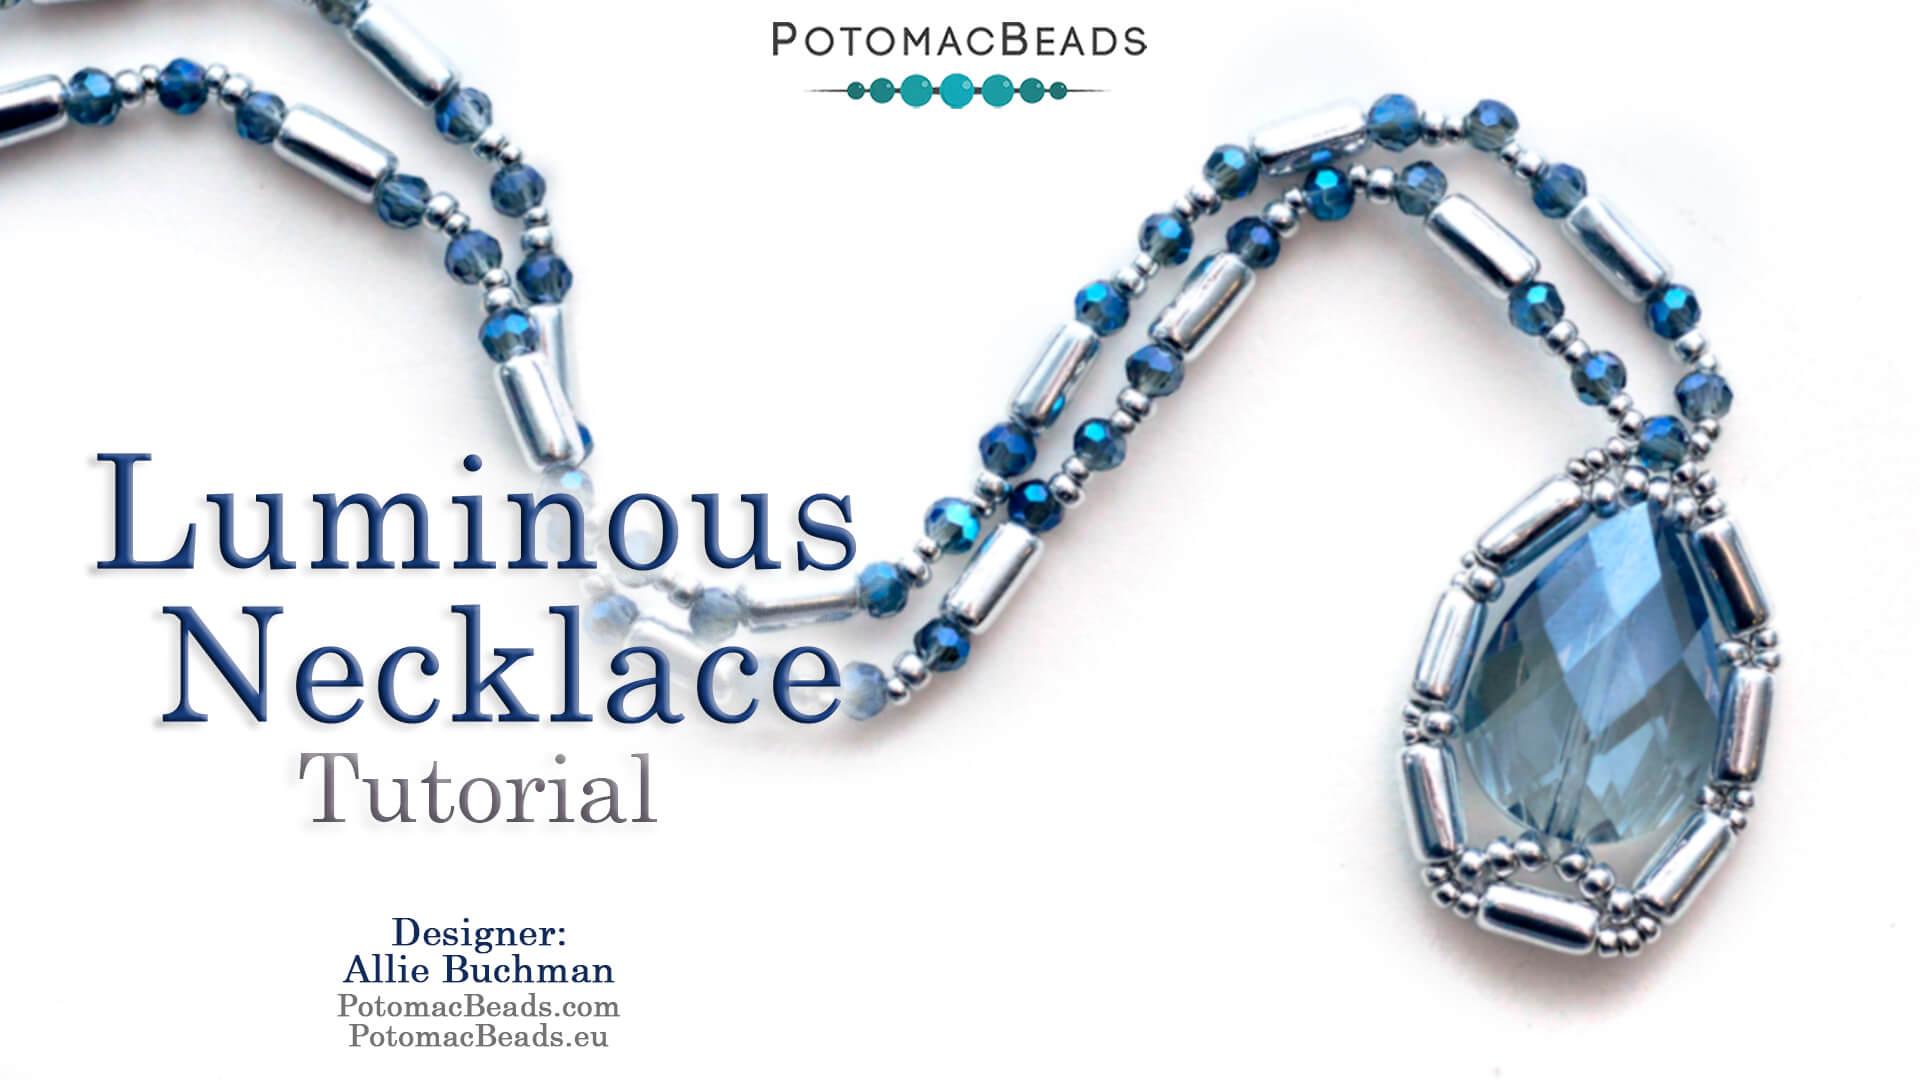 How to Bead Jewelry / Beading Tutorials & Jewel Making Videos / Bead Weaving Tutorials & Necklace Tutorial / Luminous Necklace Tutorial